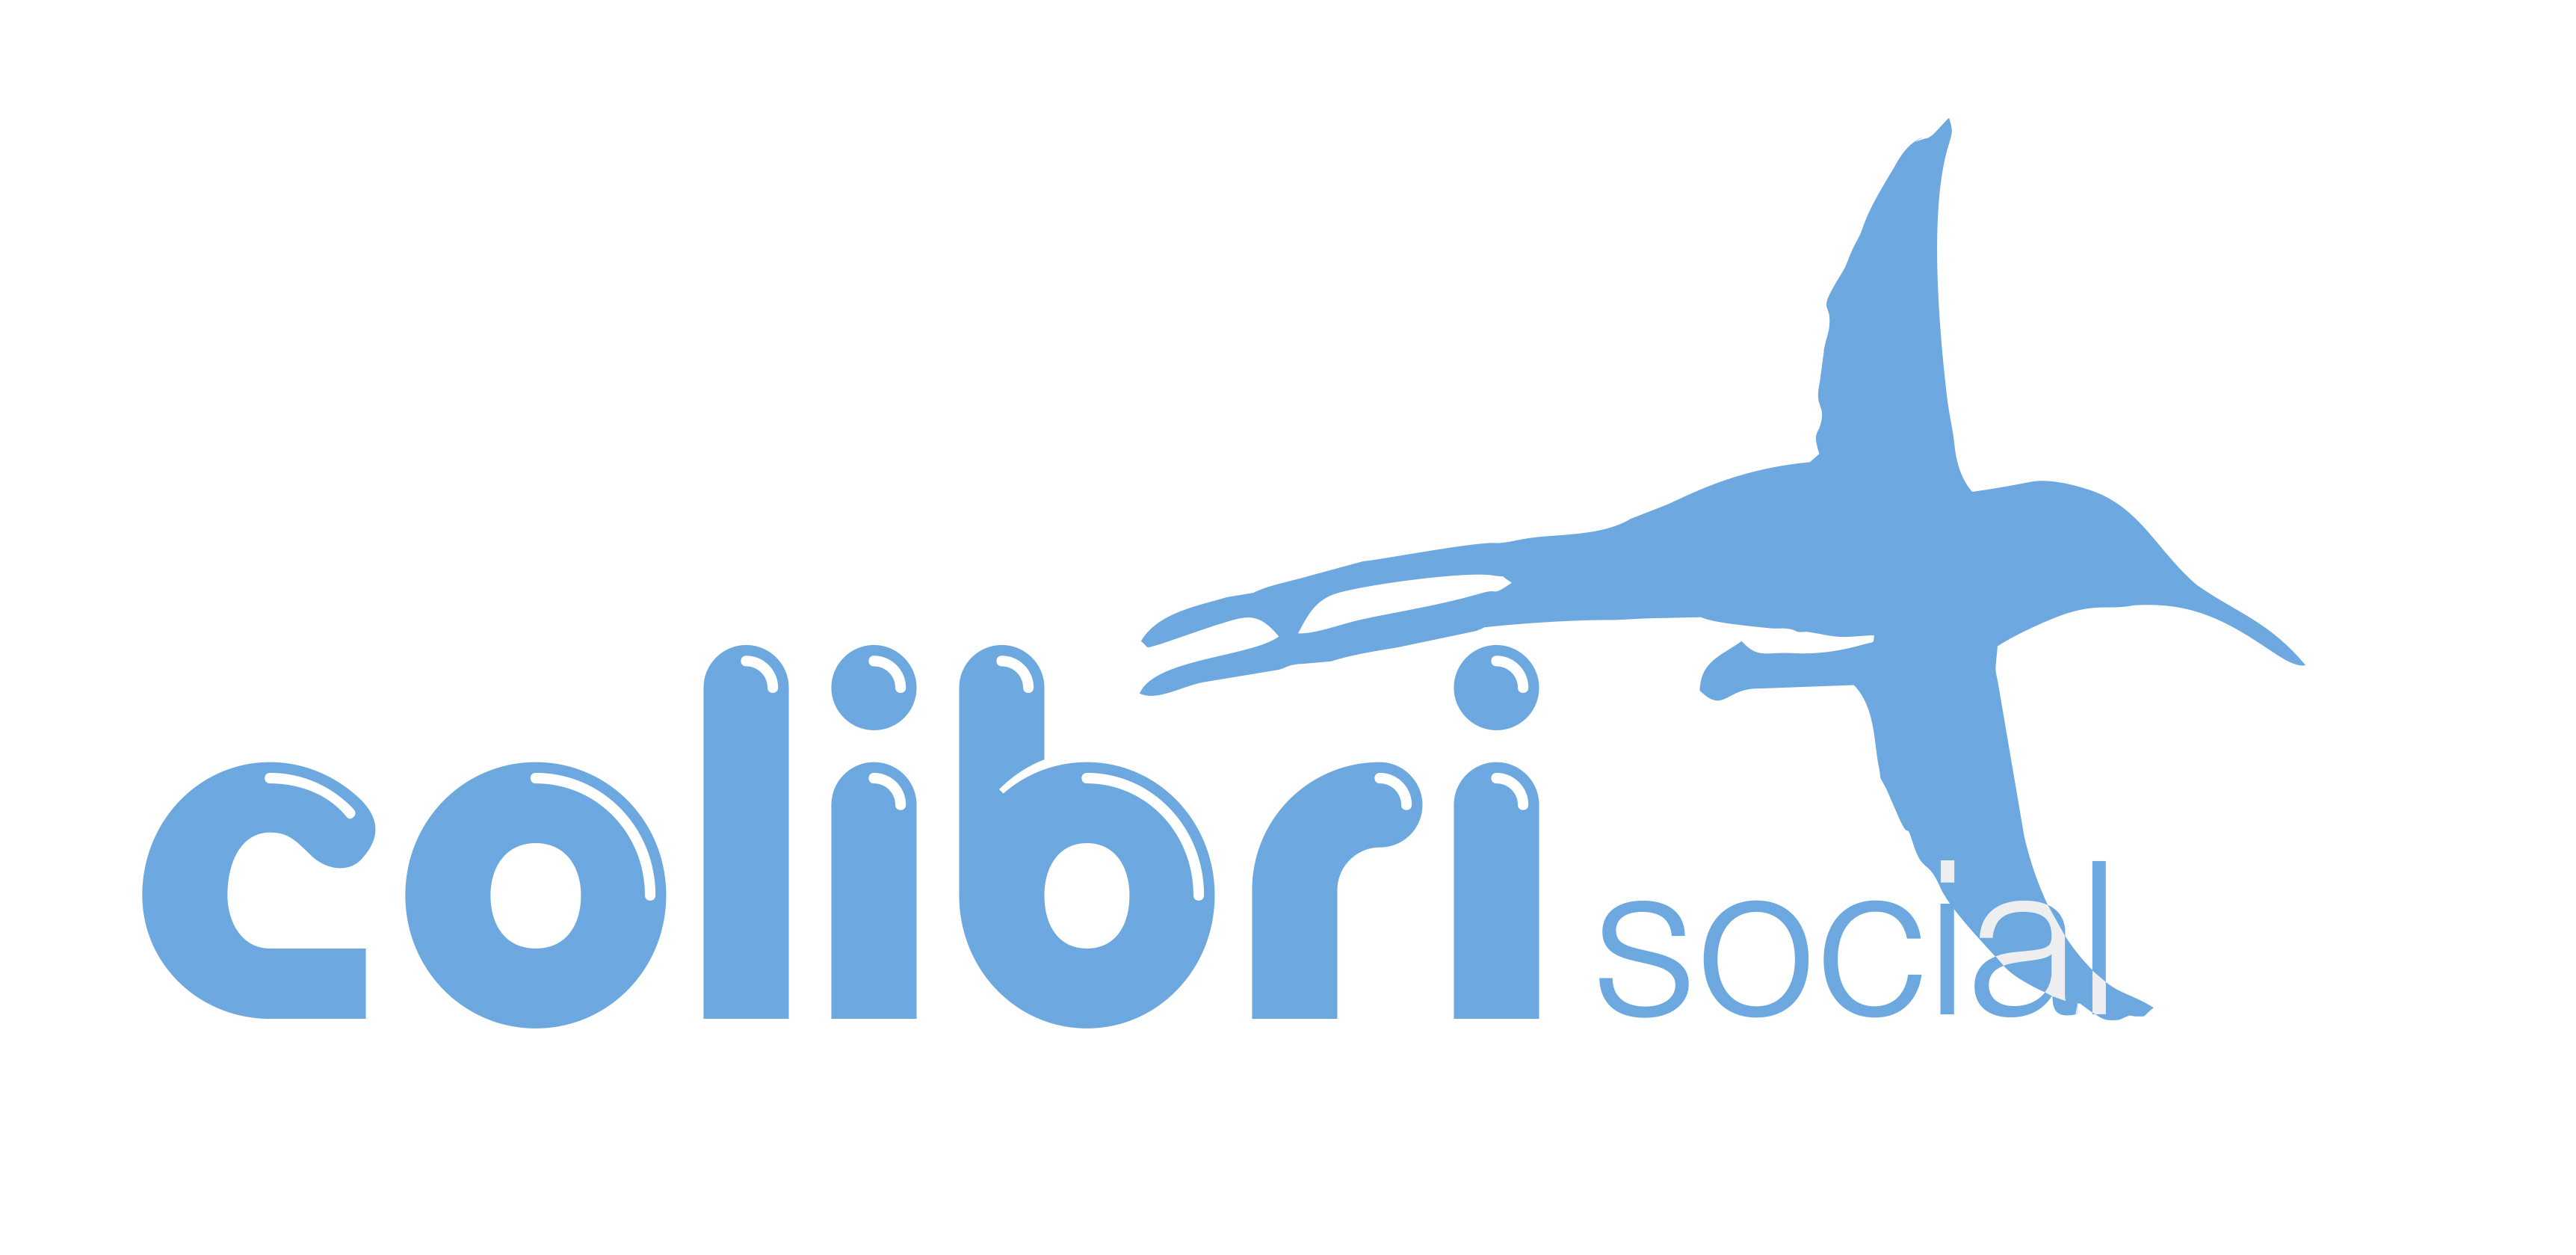 Дизайнер, разработка логотипа компании фото f_5075580cdb5f3b9b.jpg